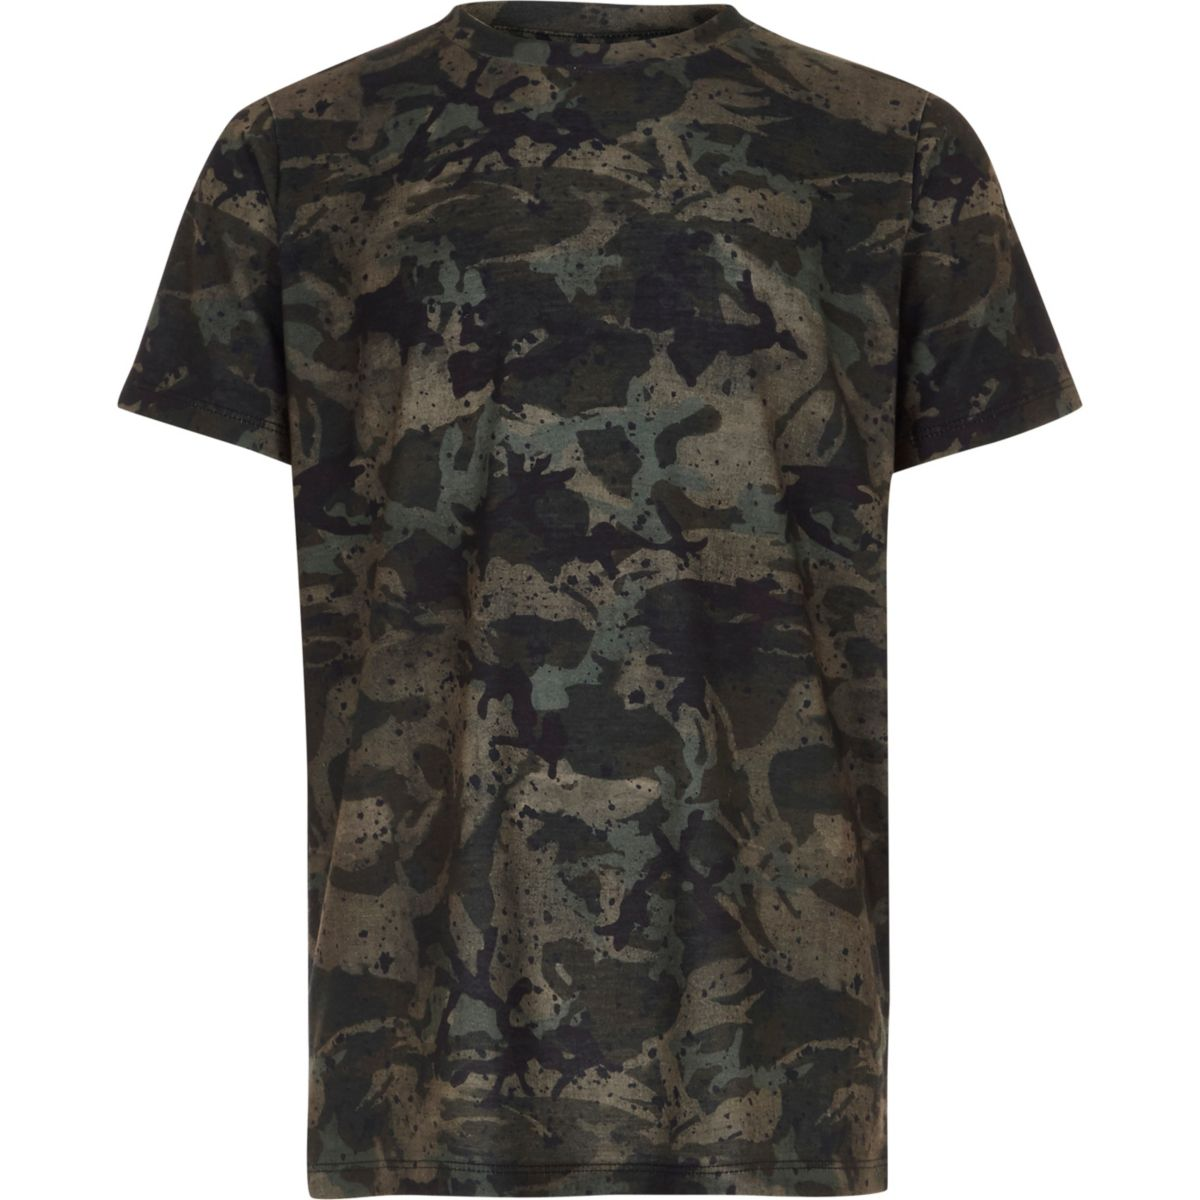 Boys khaki camo paint splat print T-shirt